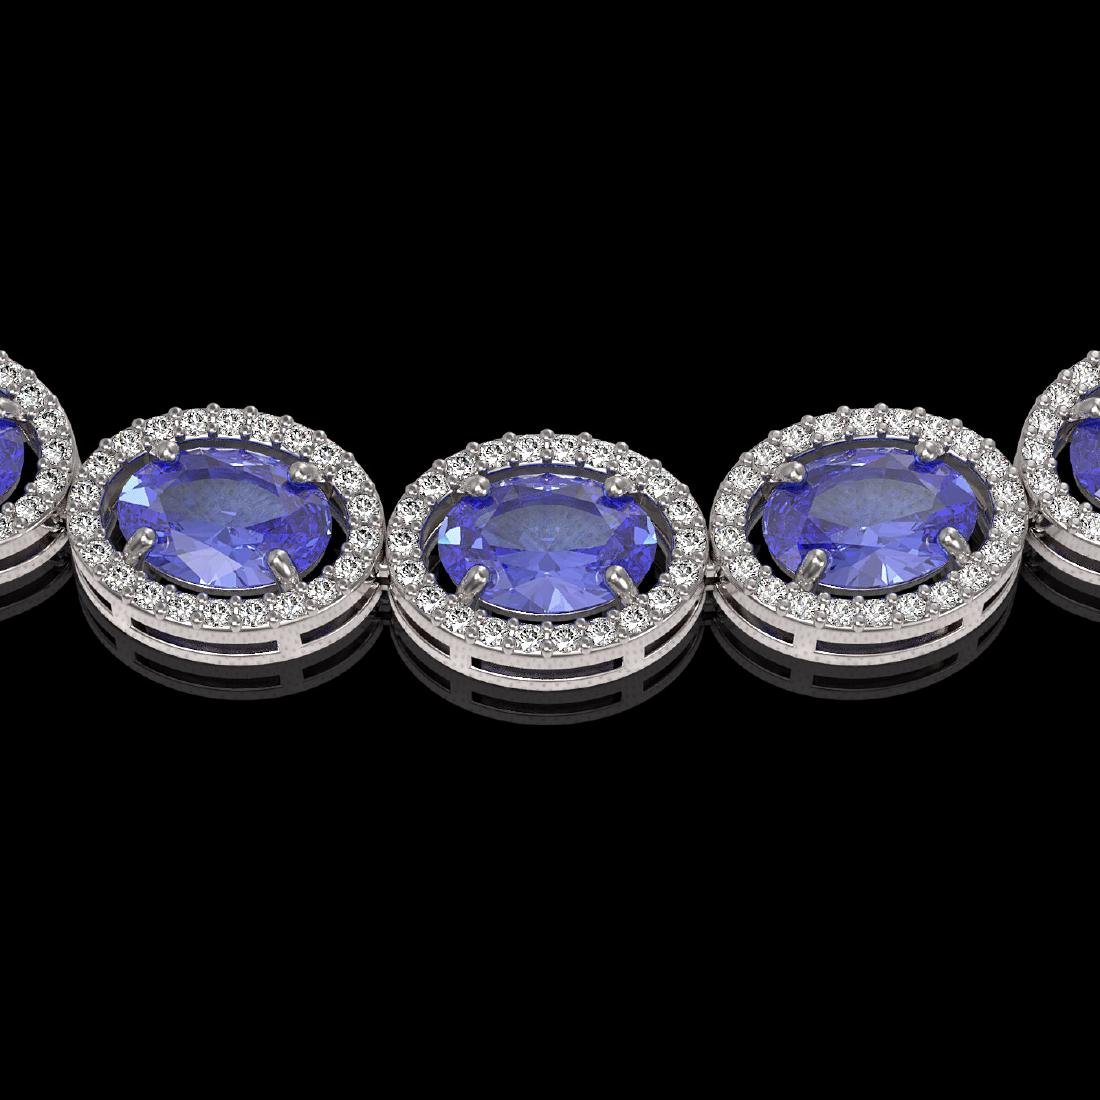 48.65 CTW Tanzanite & Diamond Halo Necklace 10K White - 3